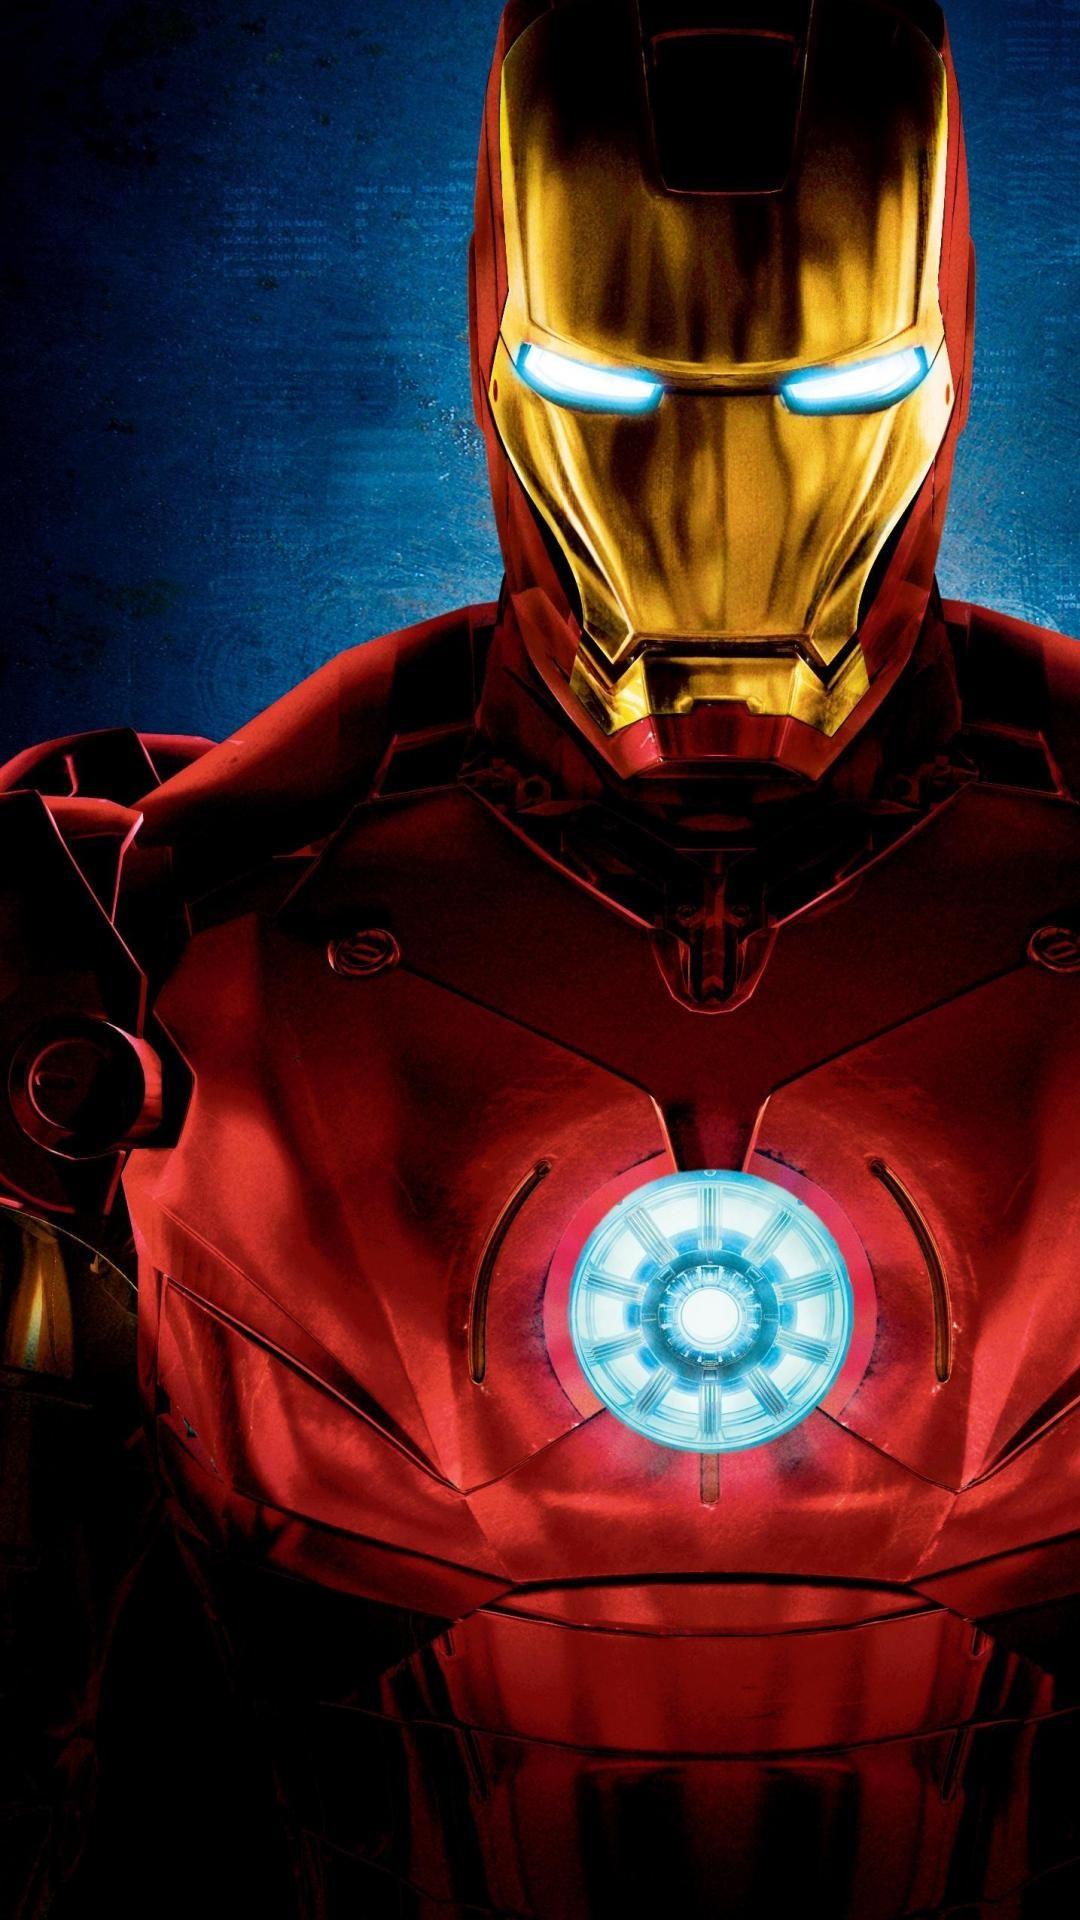 Pin Oleh David Phang Di Iron Man Iron Man Wallpaper Man Wallpaper